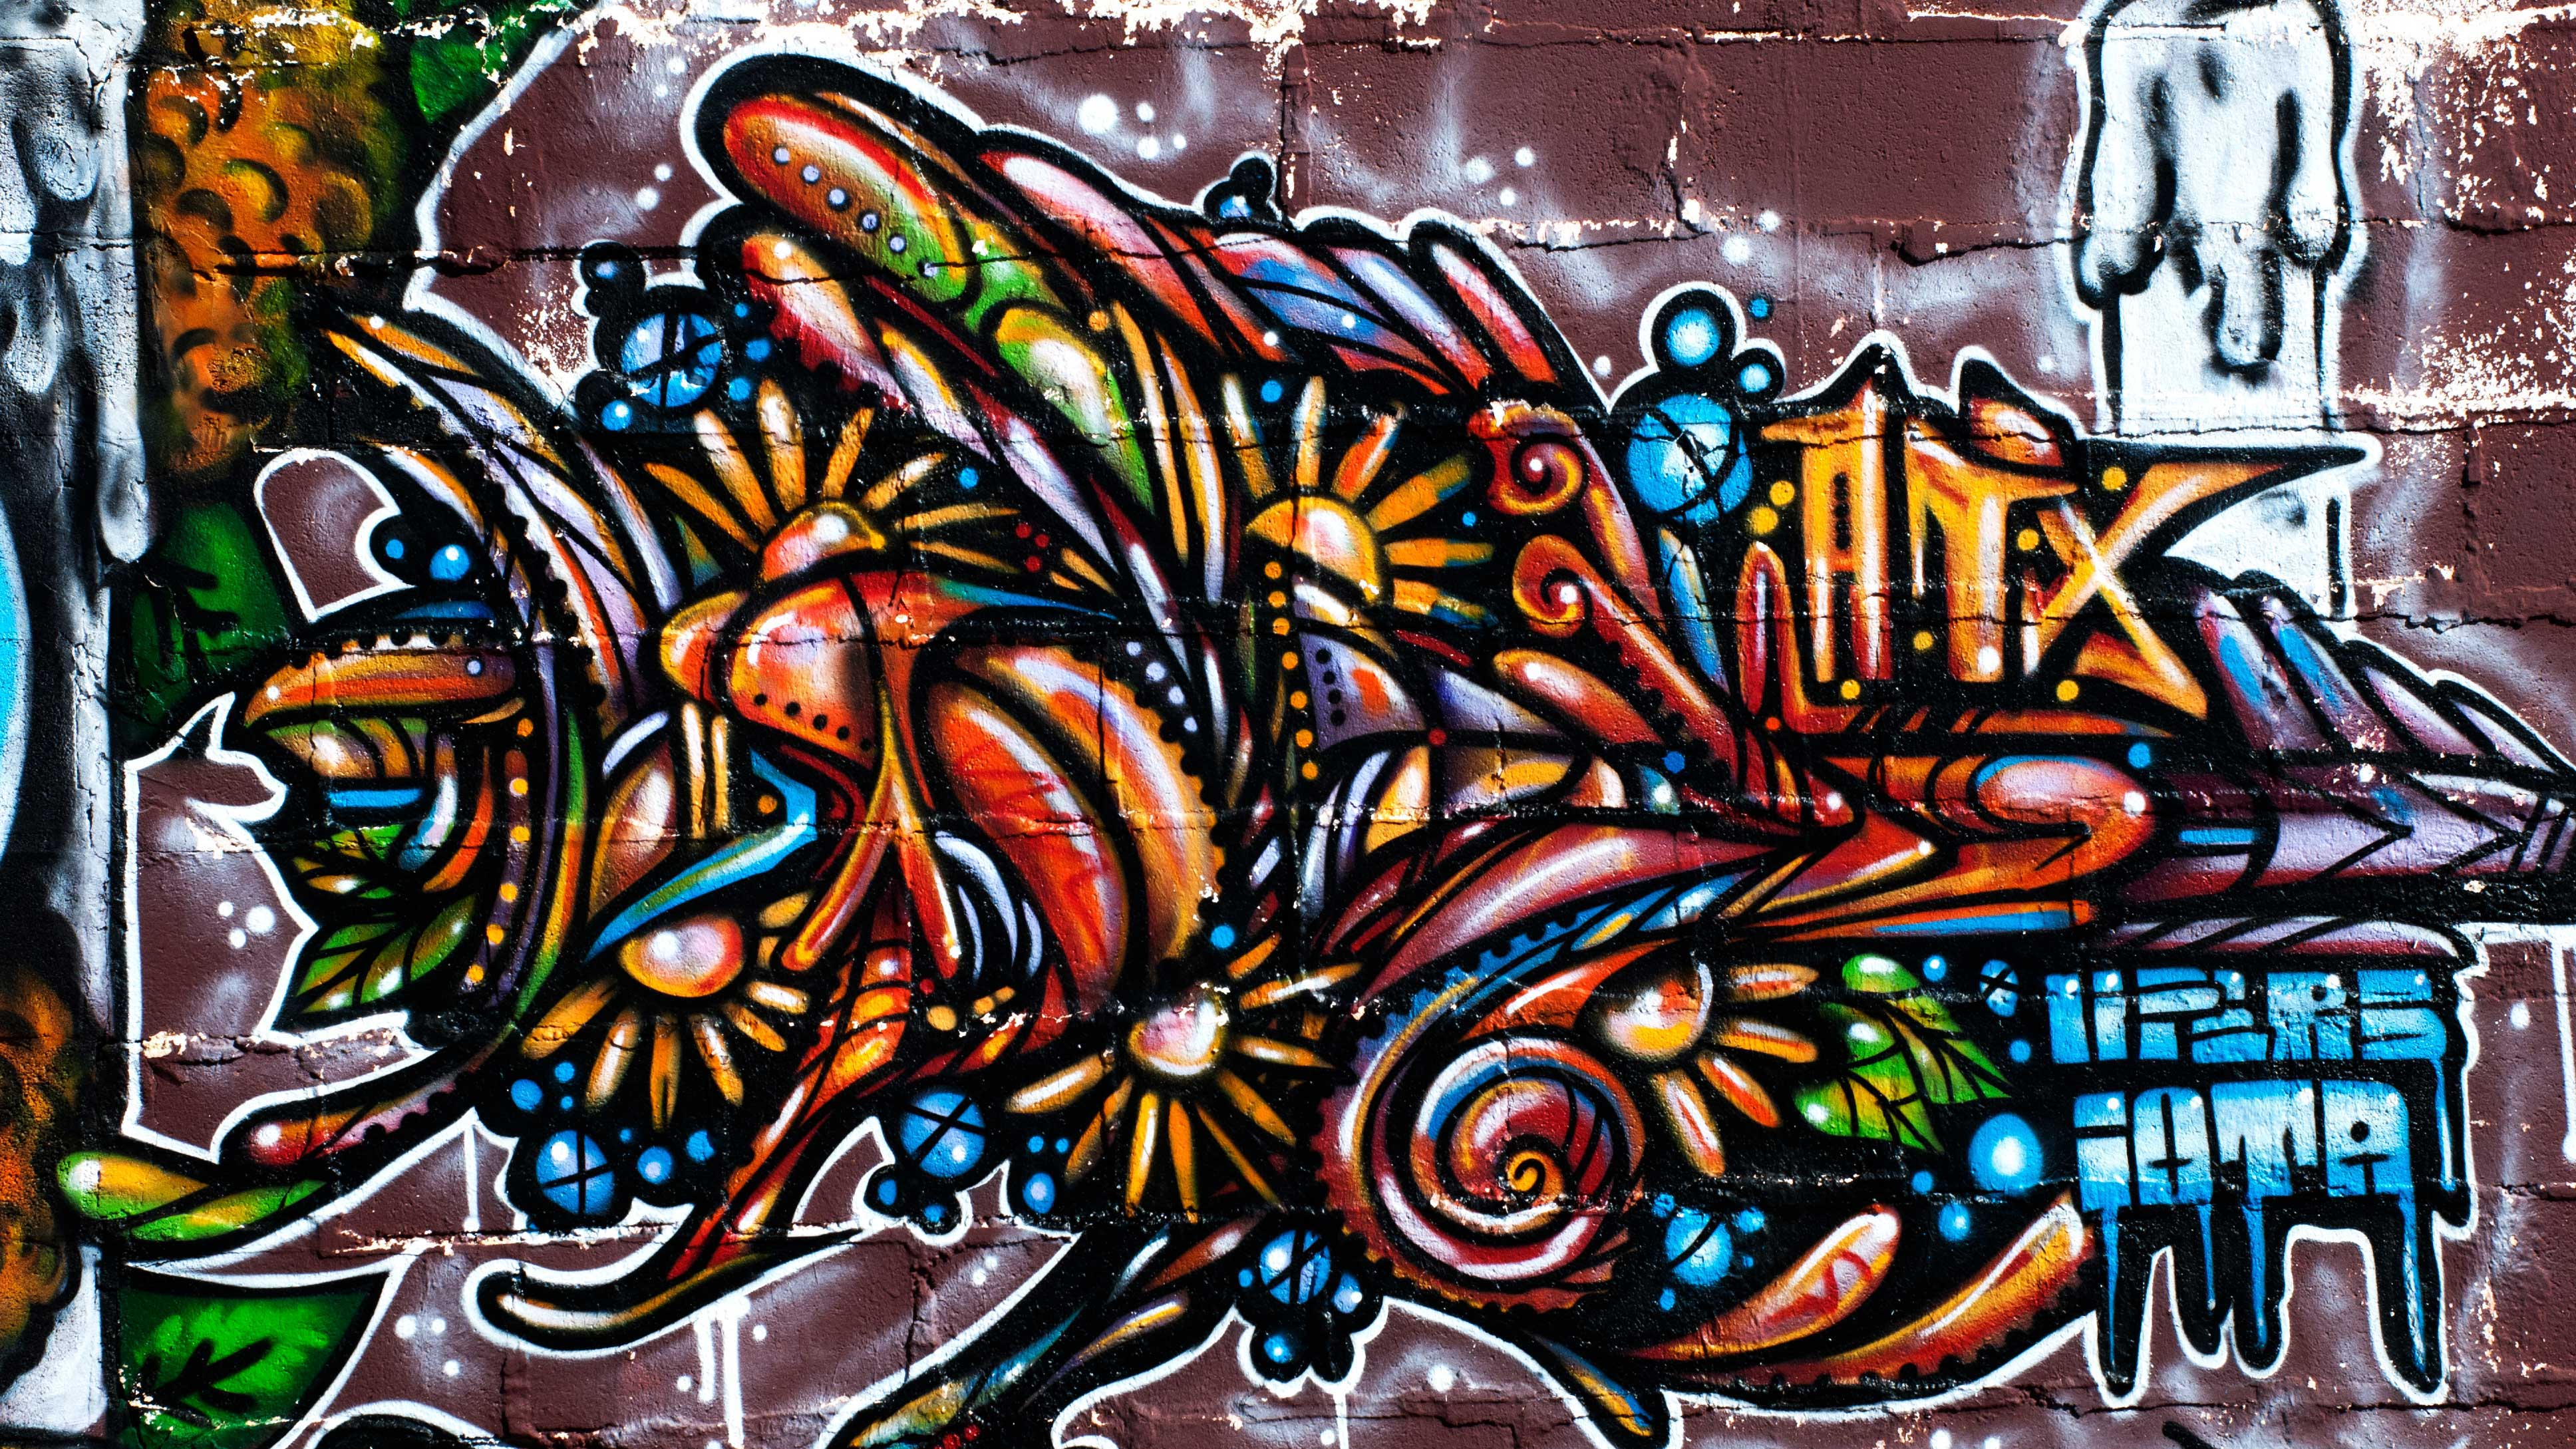 32 Awesome Graffiti Wallpapers On Wallpapersafari